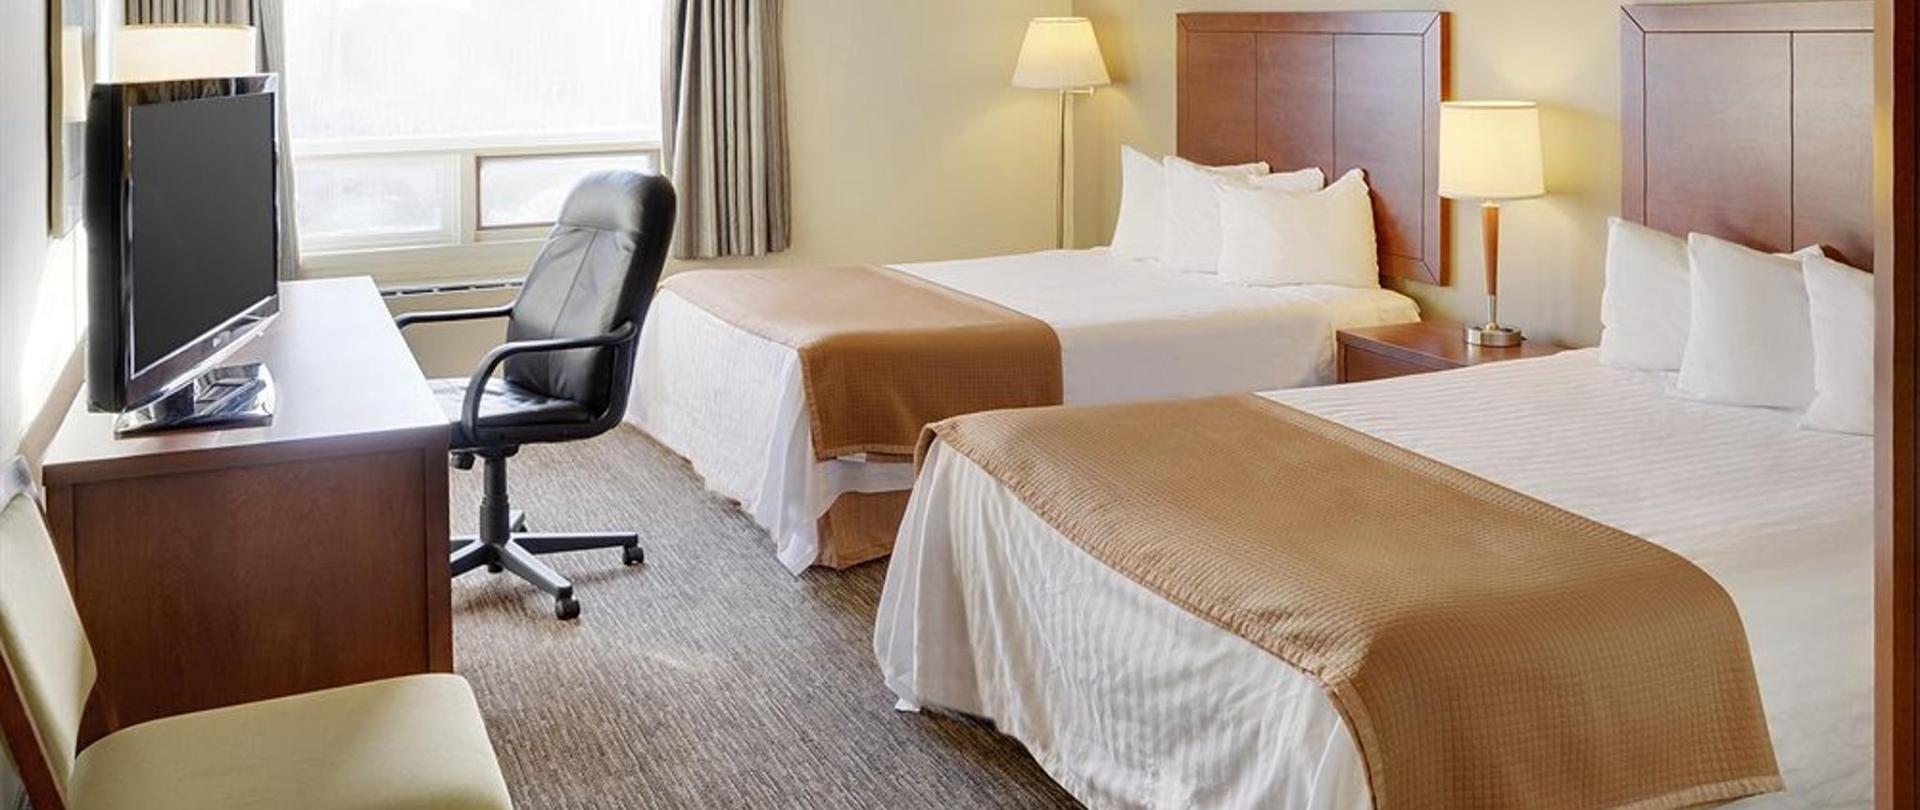 2 beds.jpg